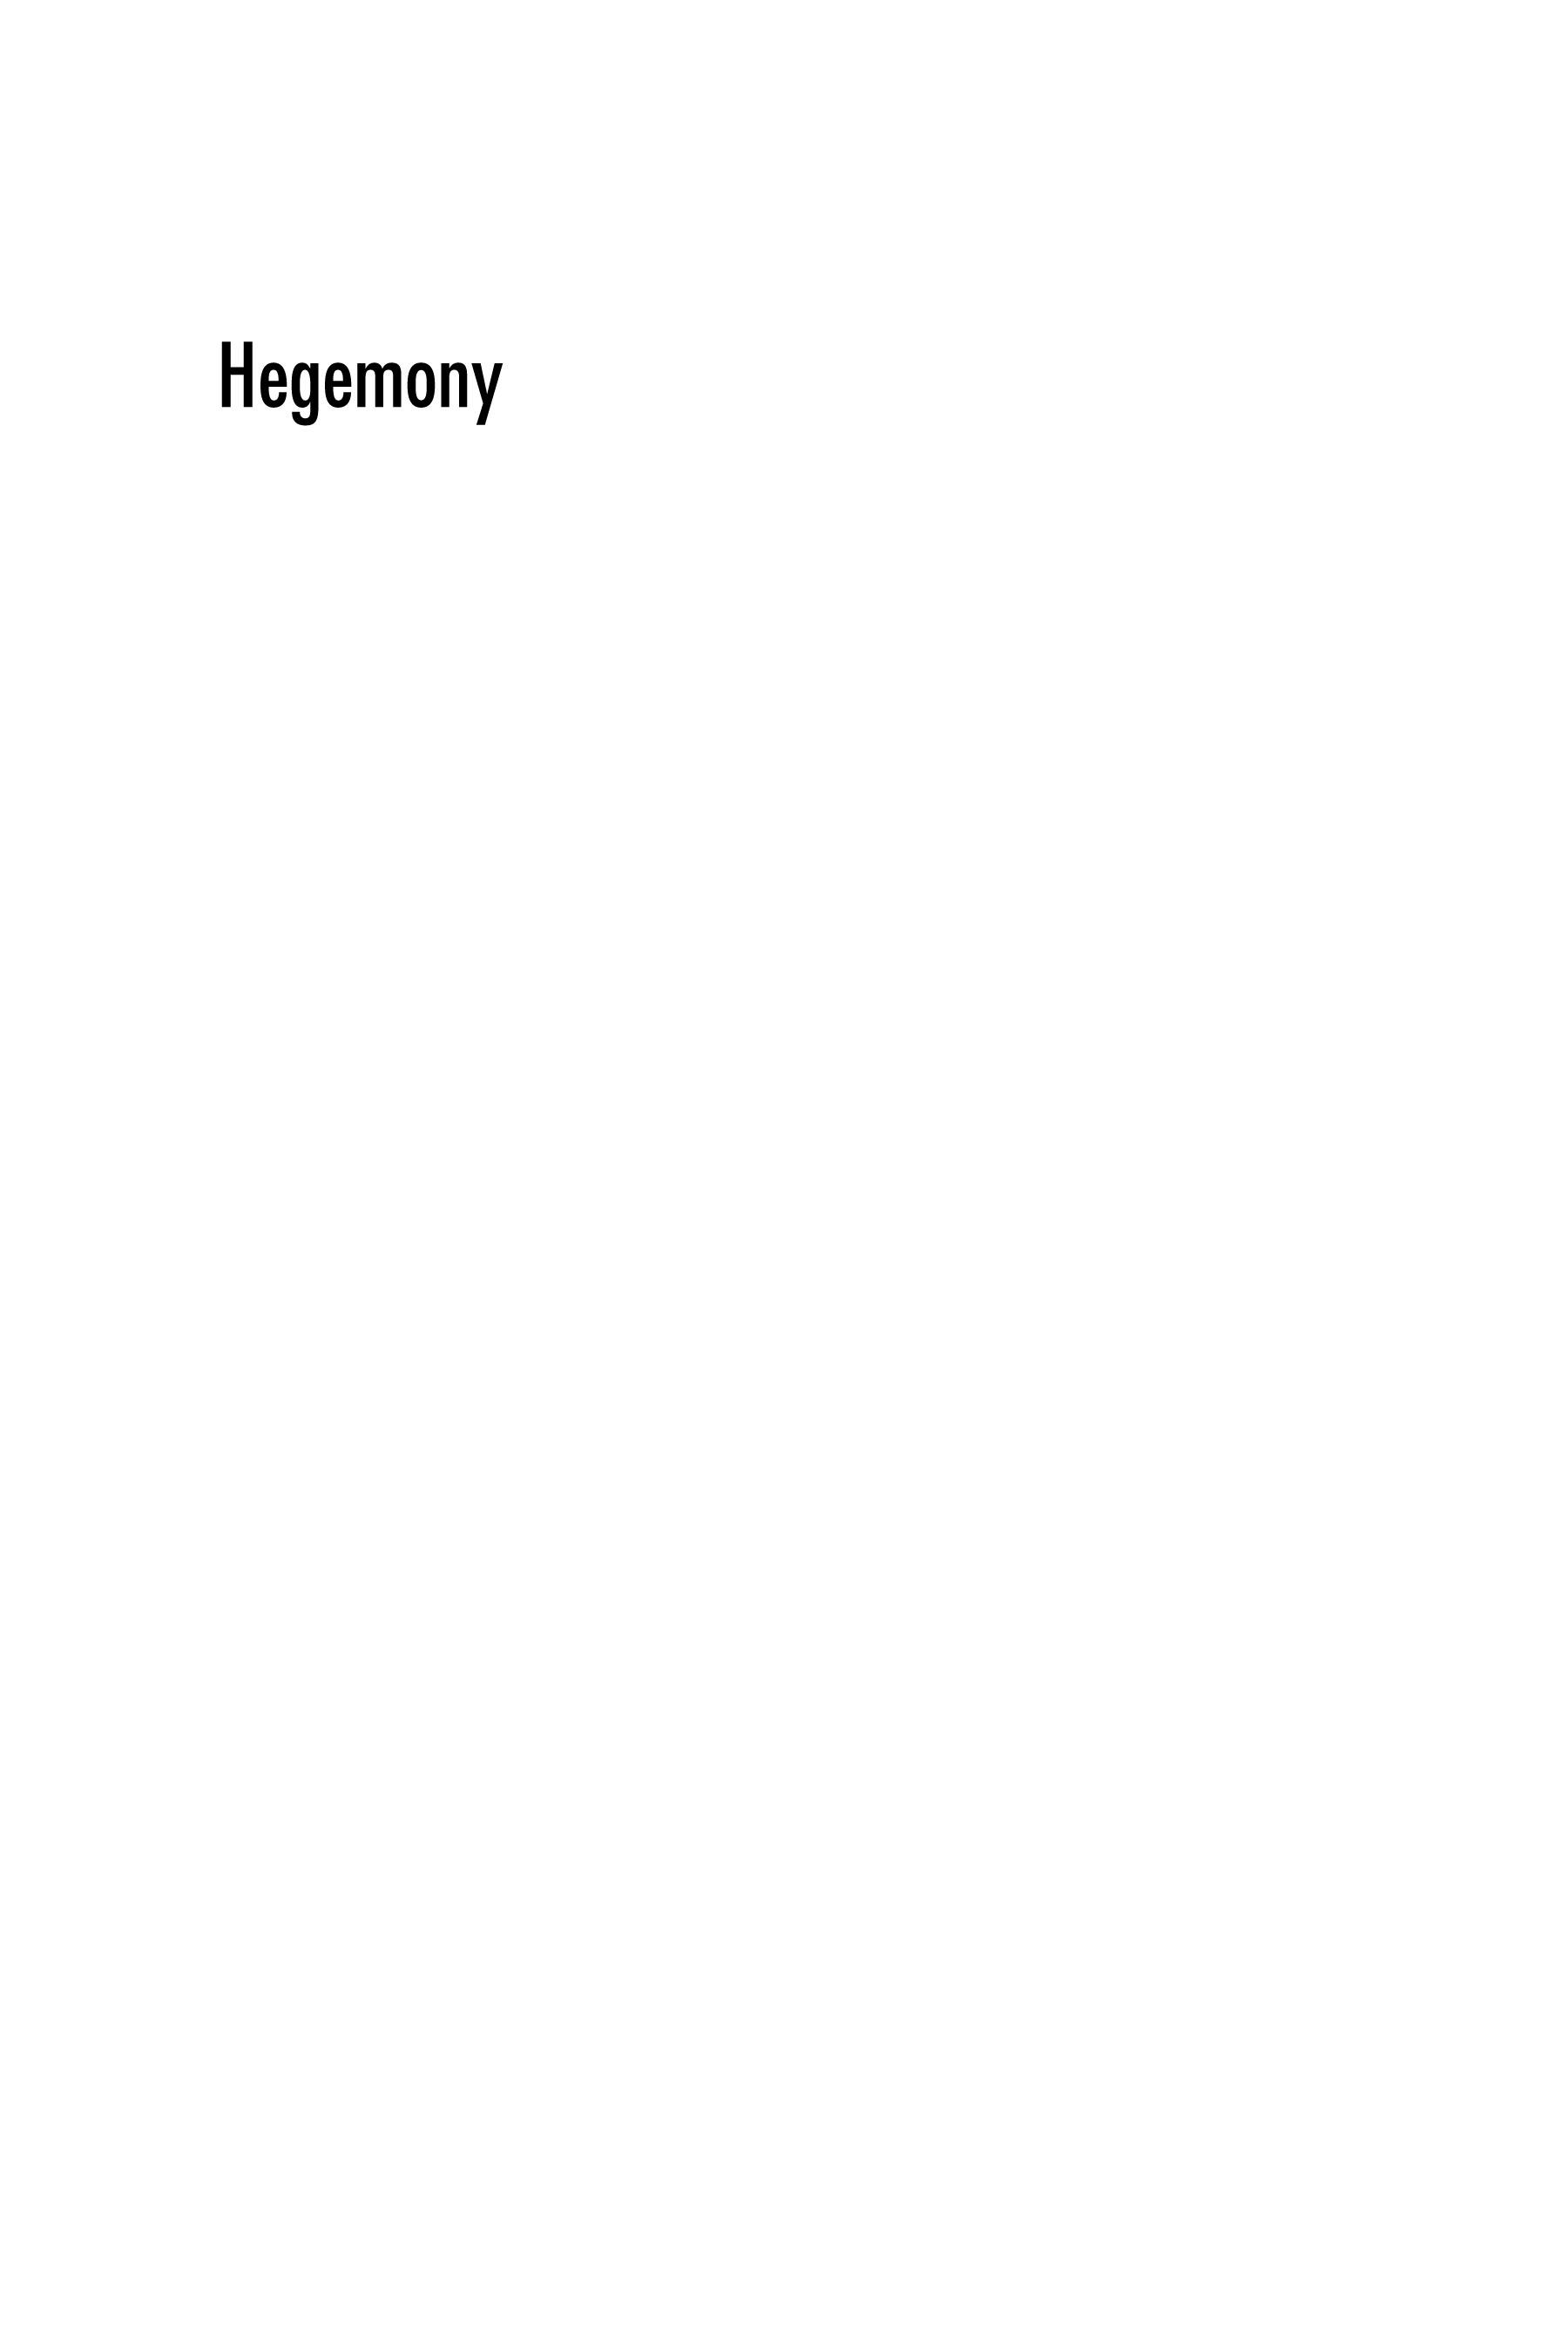 Hegemony: The New Shape of Global Power EB9781592137671